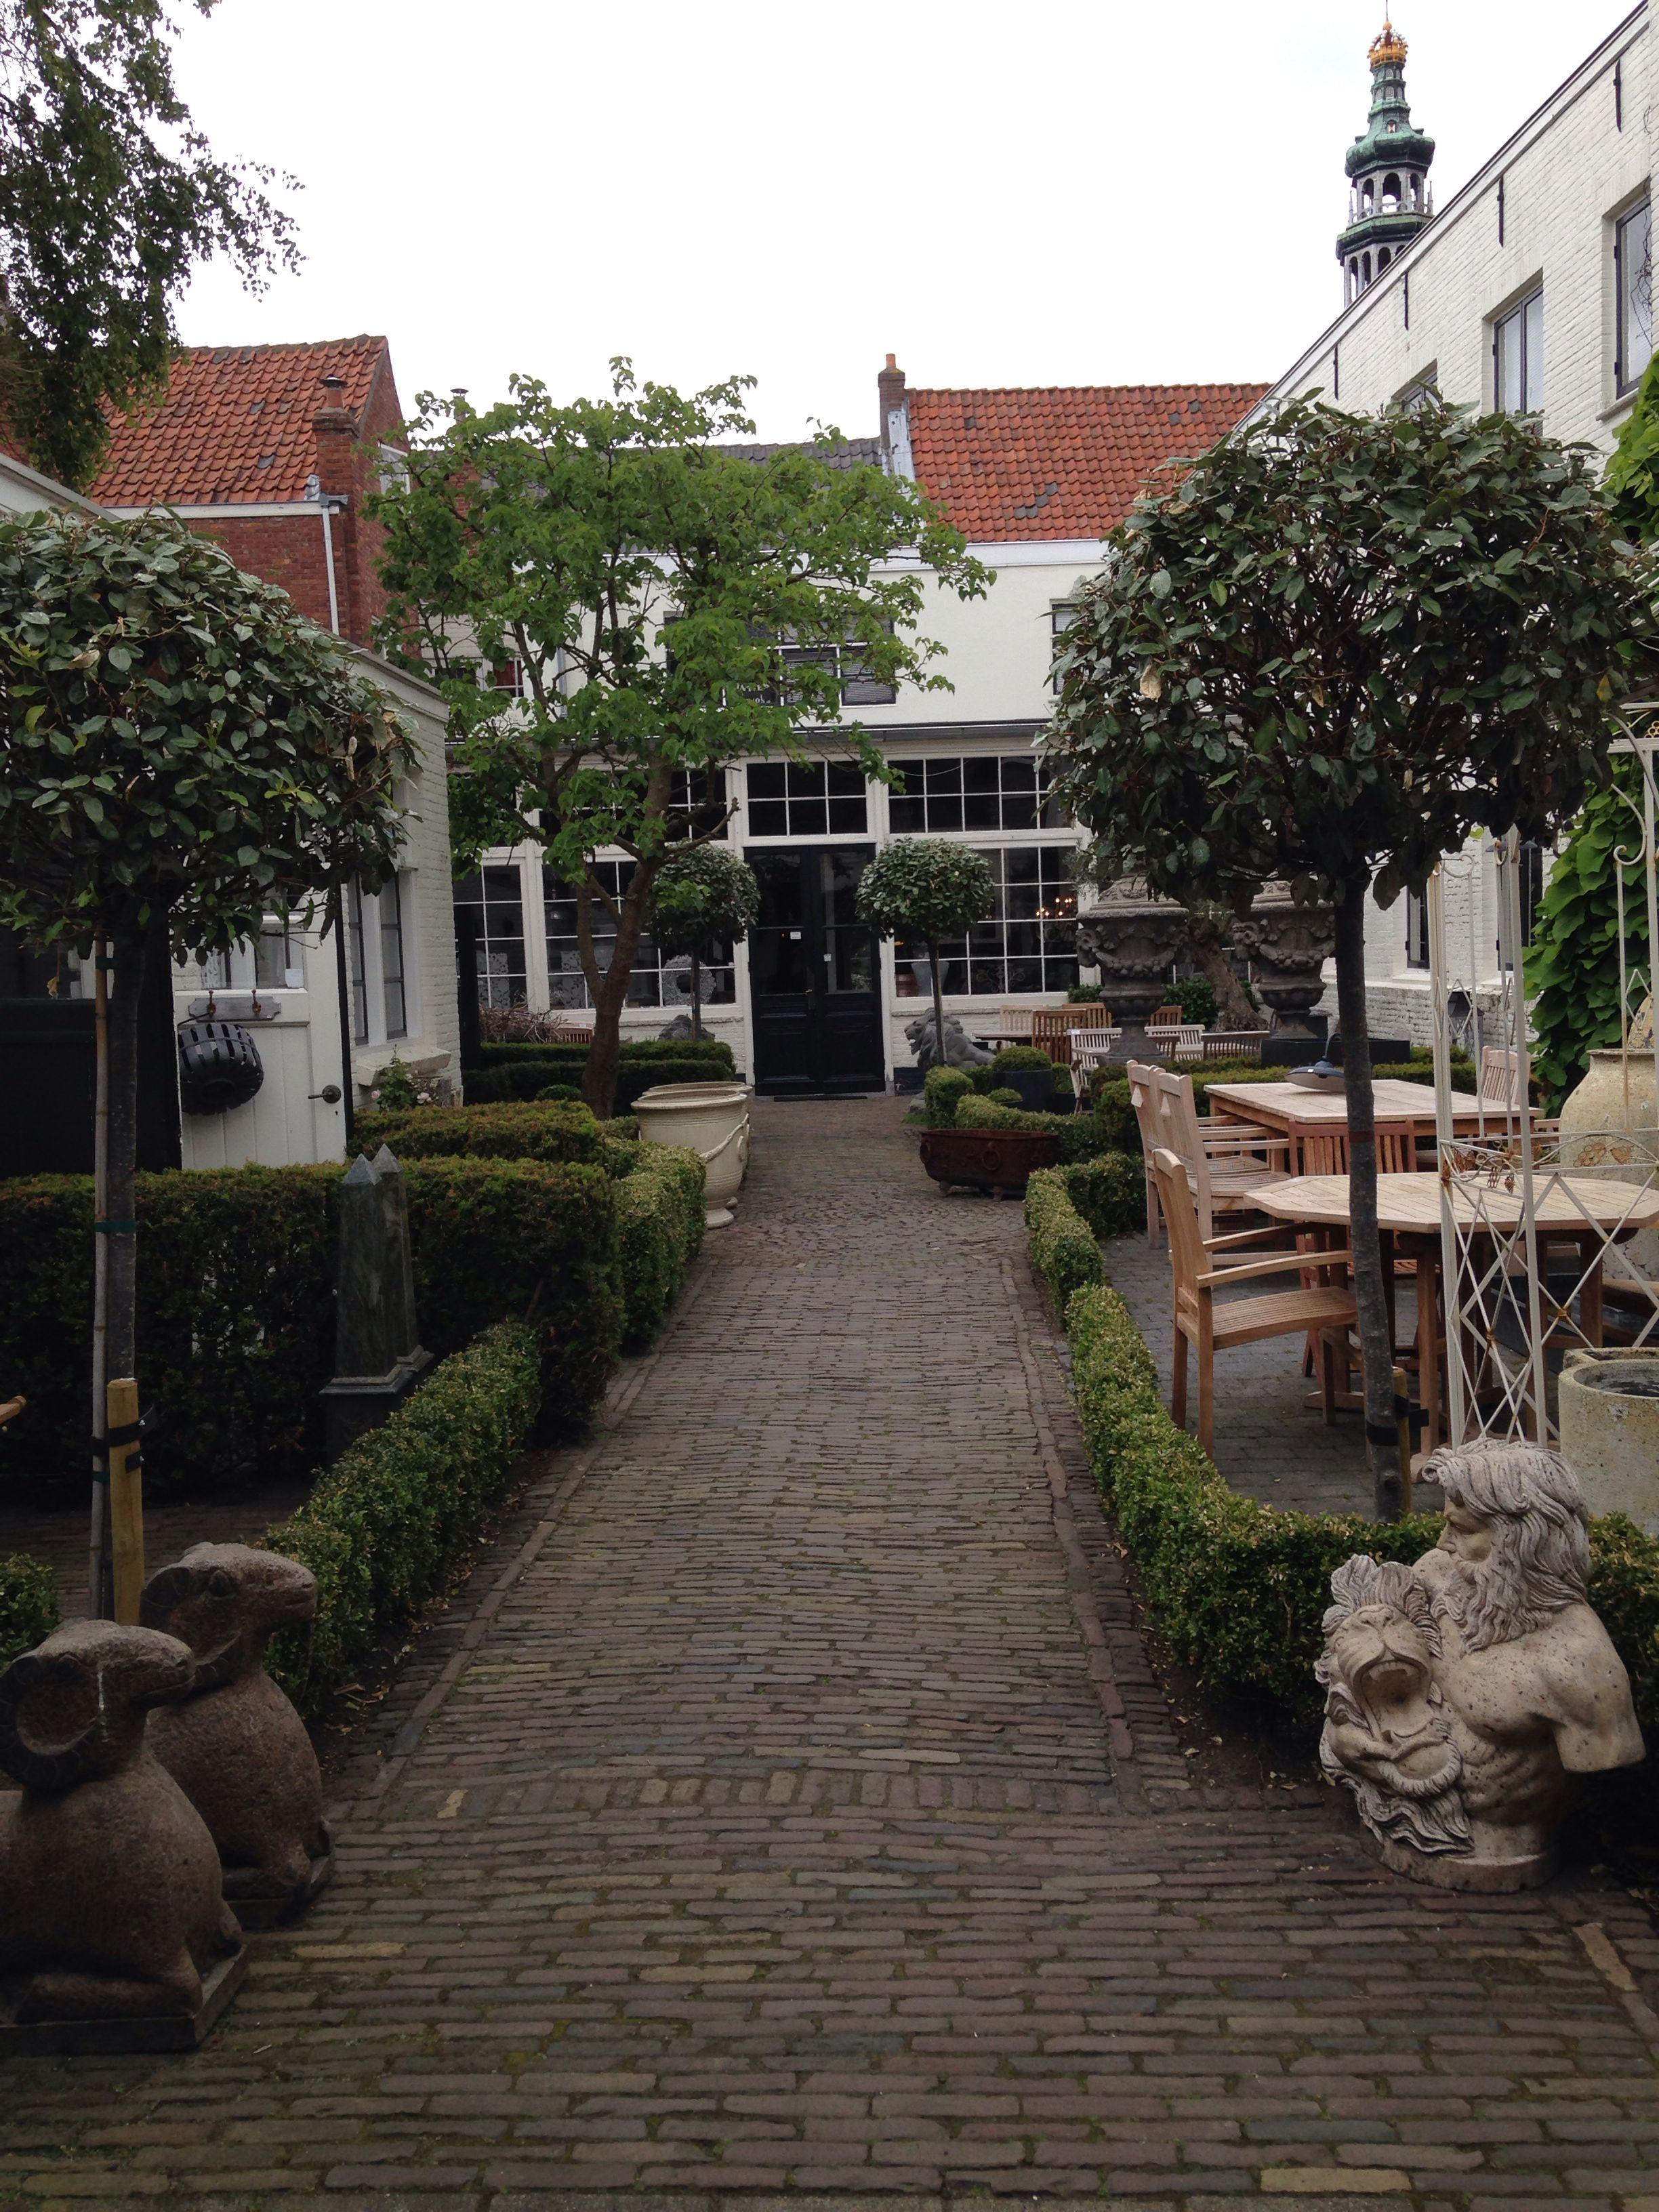 Pagter interieur in Middelburg   Mijn favoriete shops   Pinterest